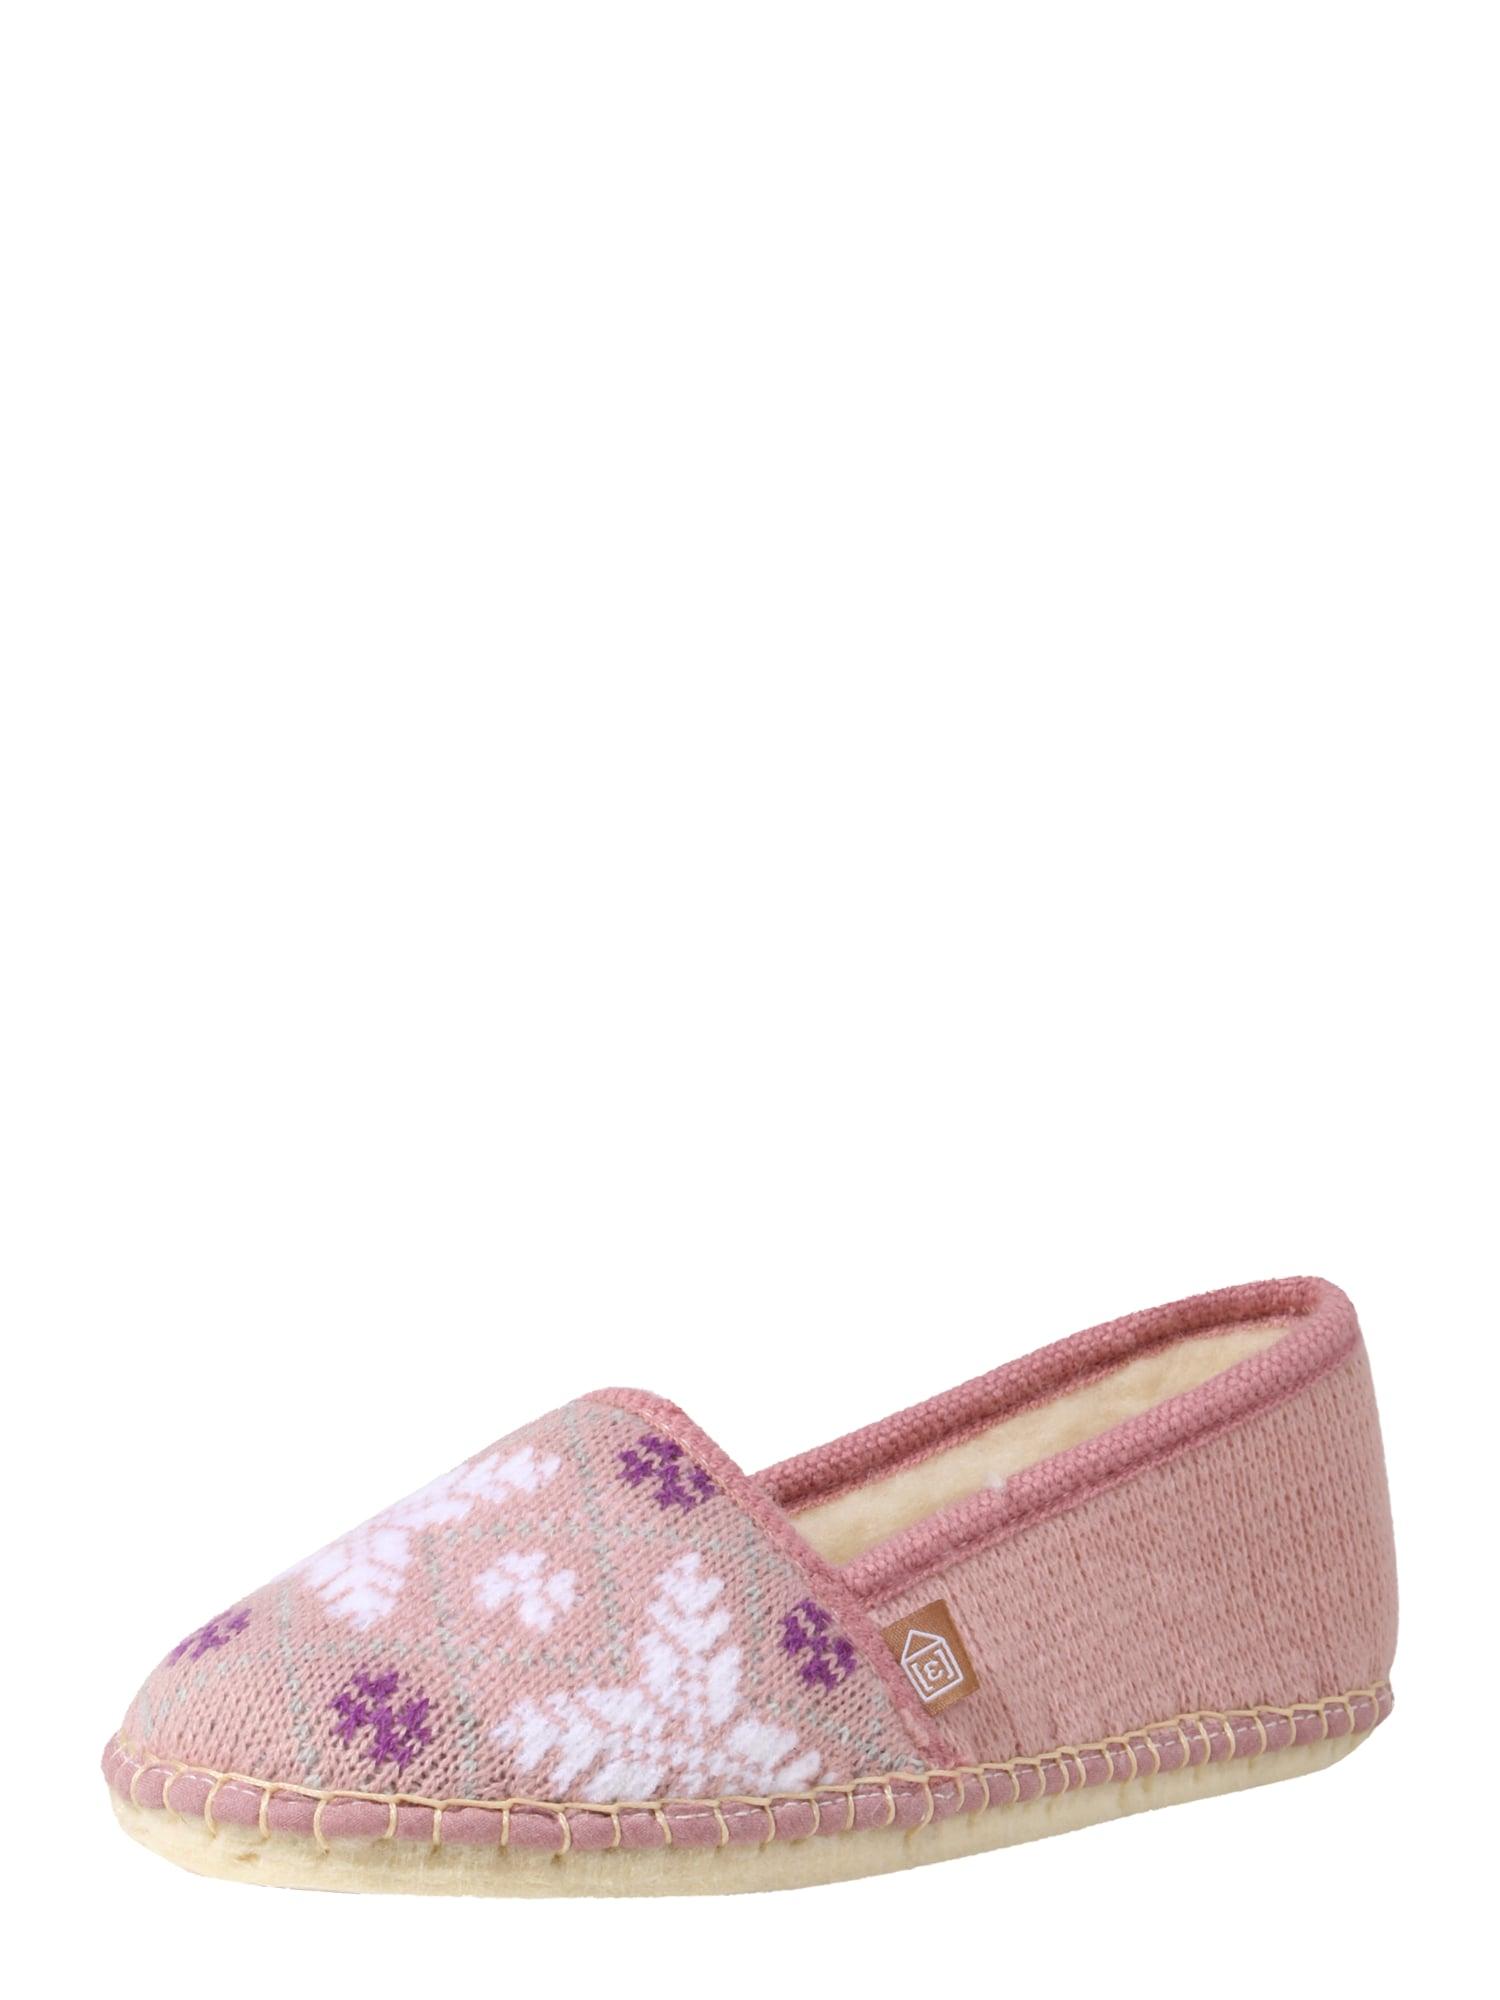 Pantofle CLASSIC růže bílá Espadrij L´originale